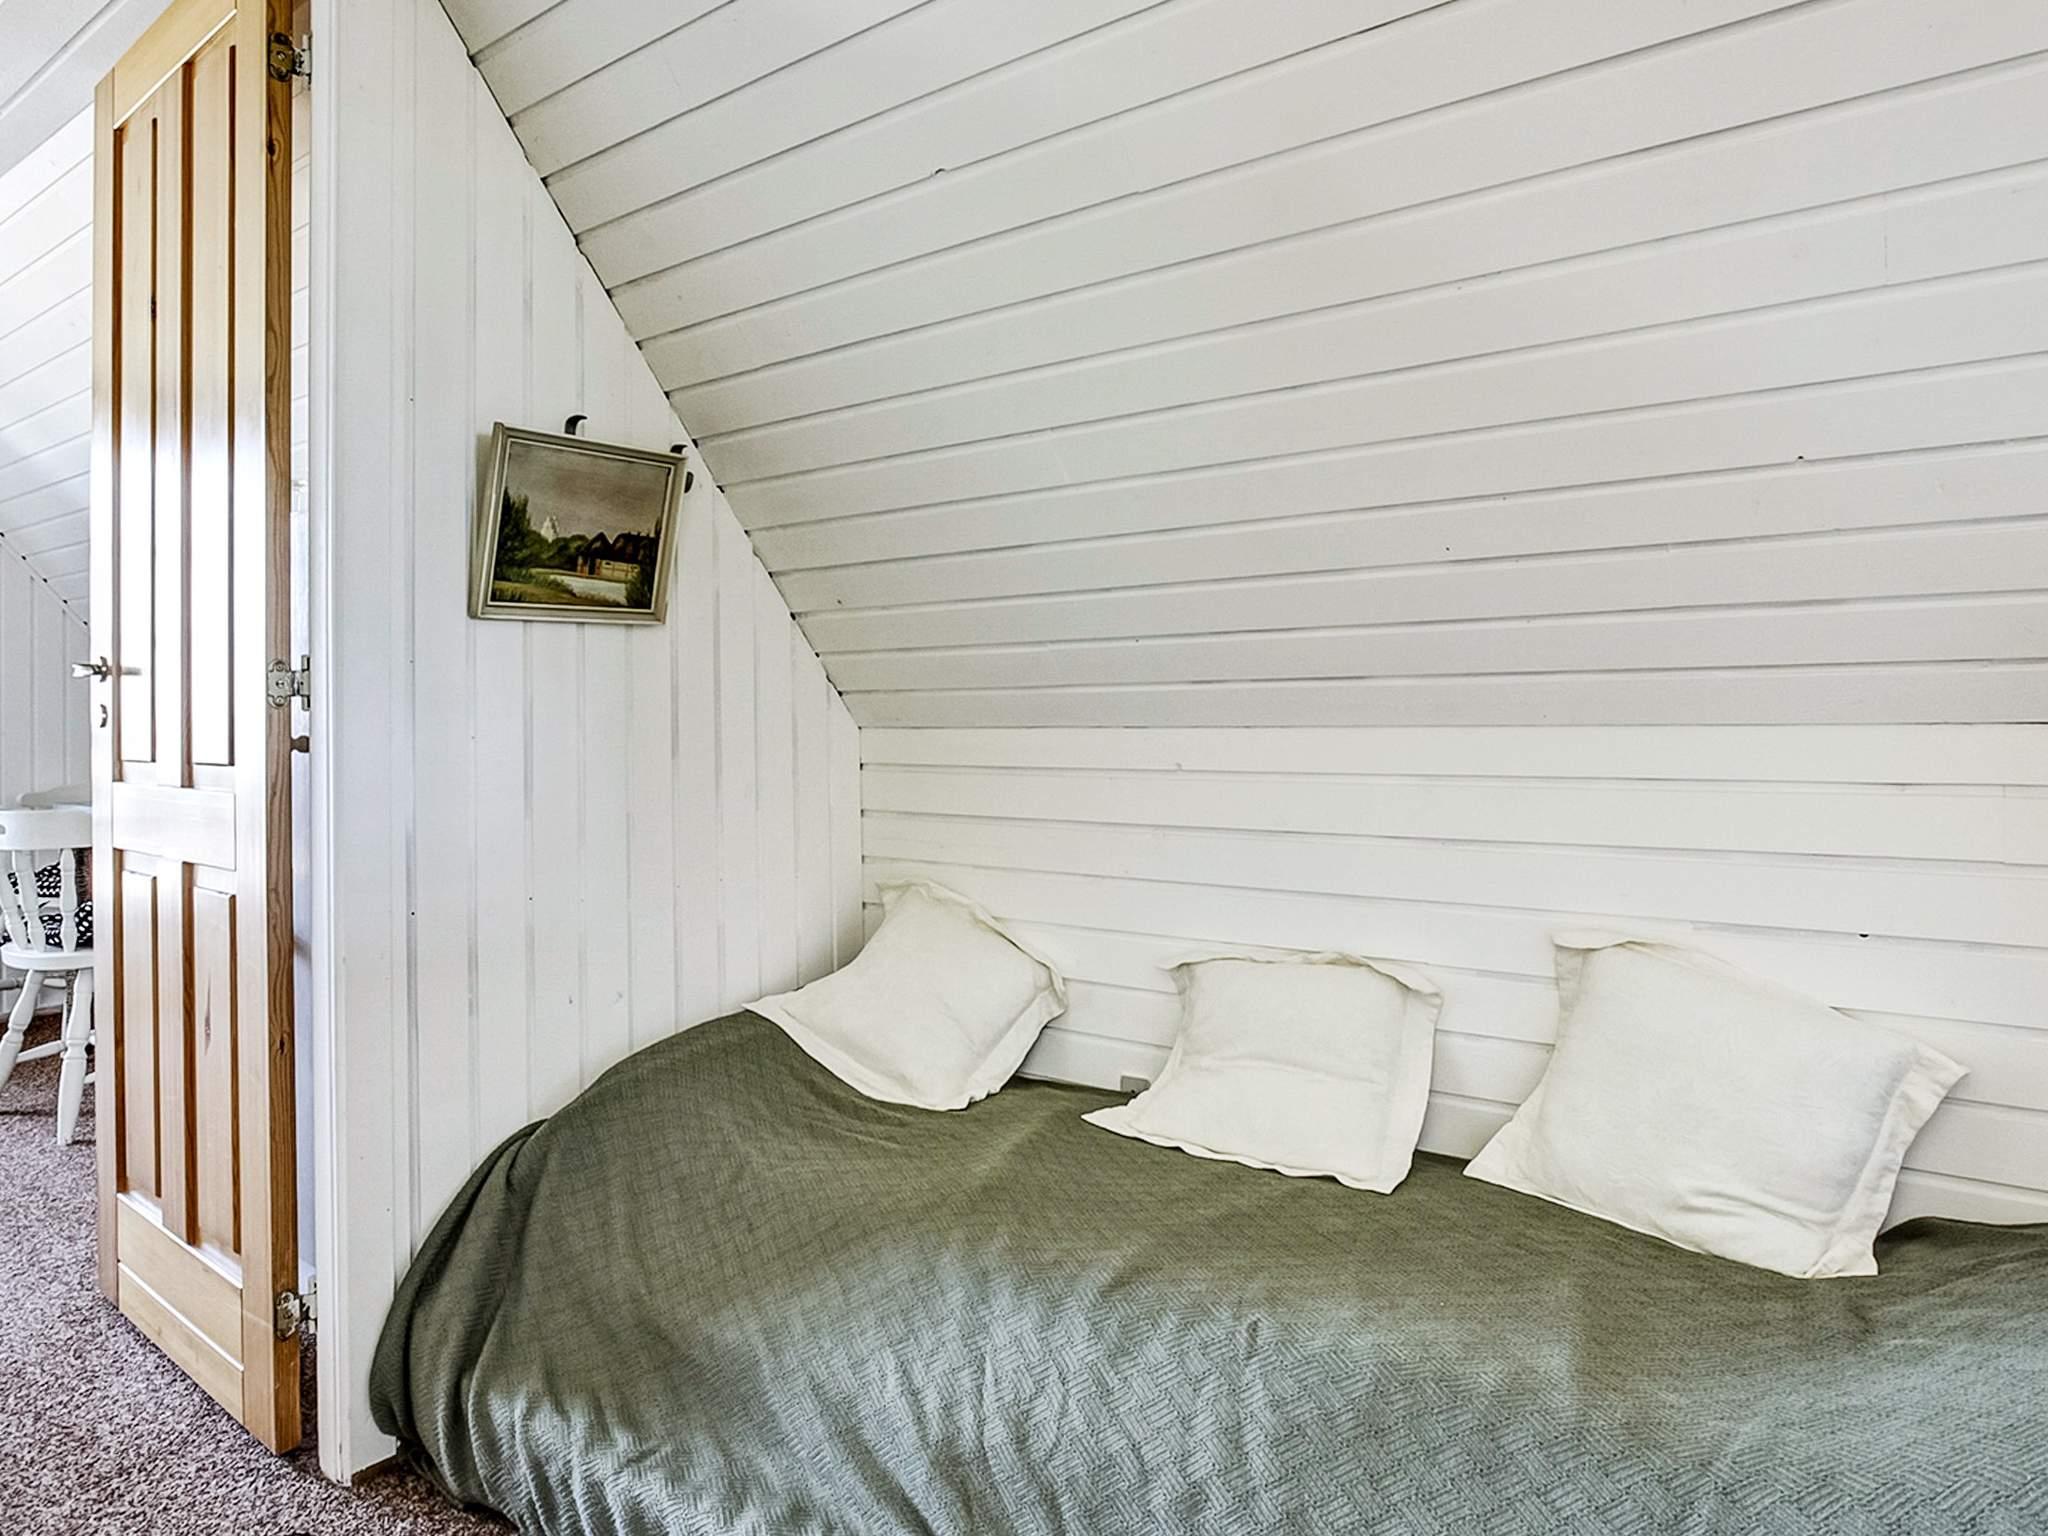 Ferienhaus Vrist (82635), Vrist, , Limfjord, Dänemark, Bild 11